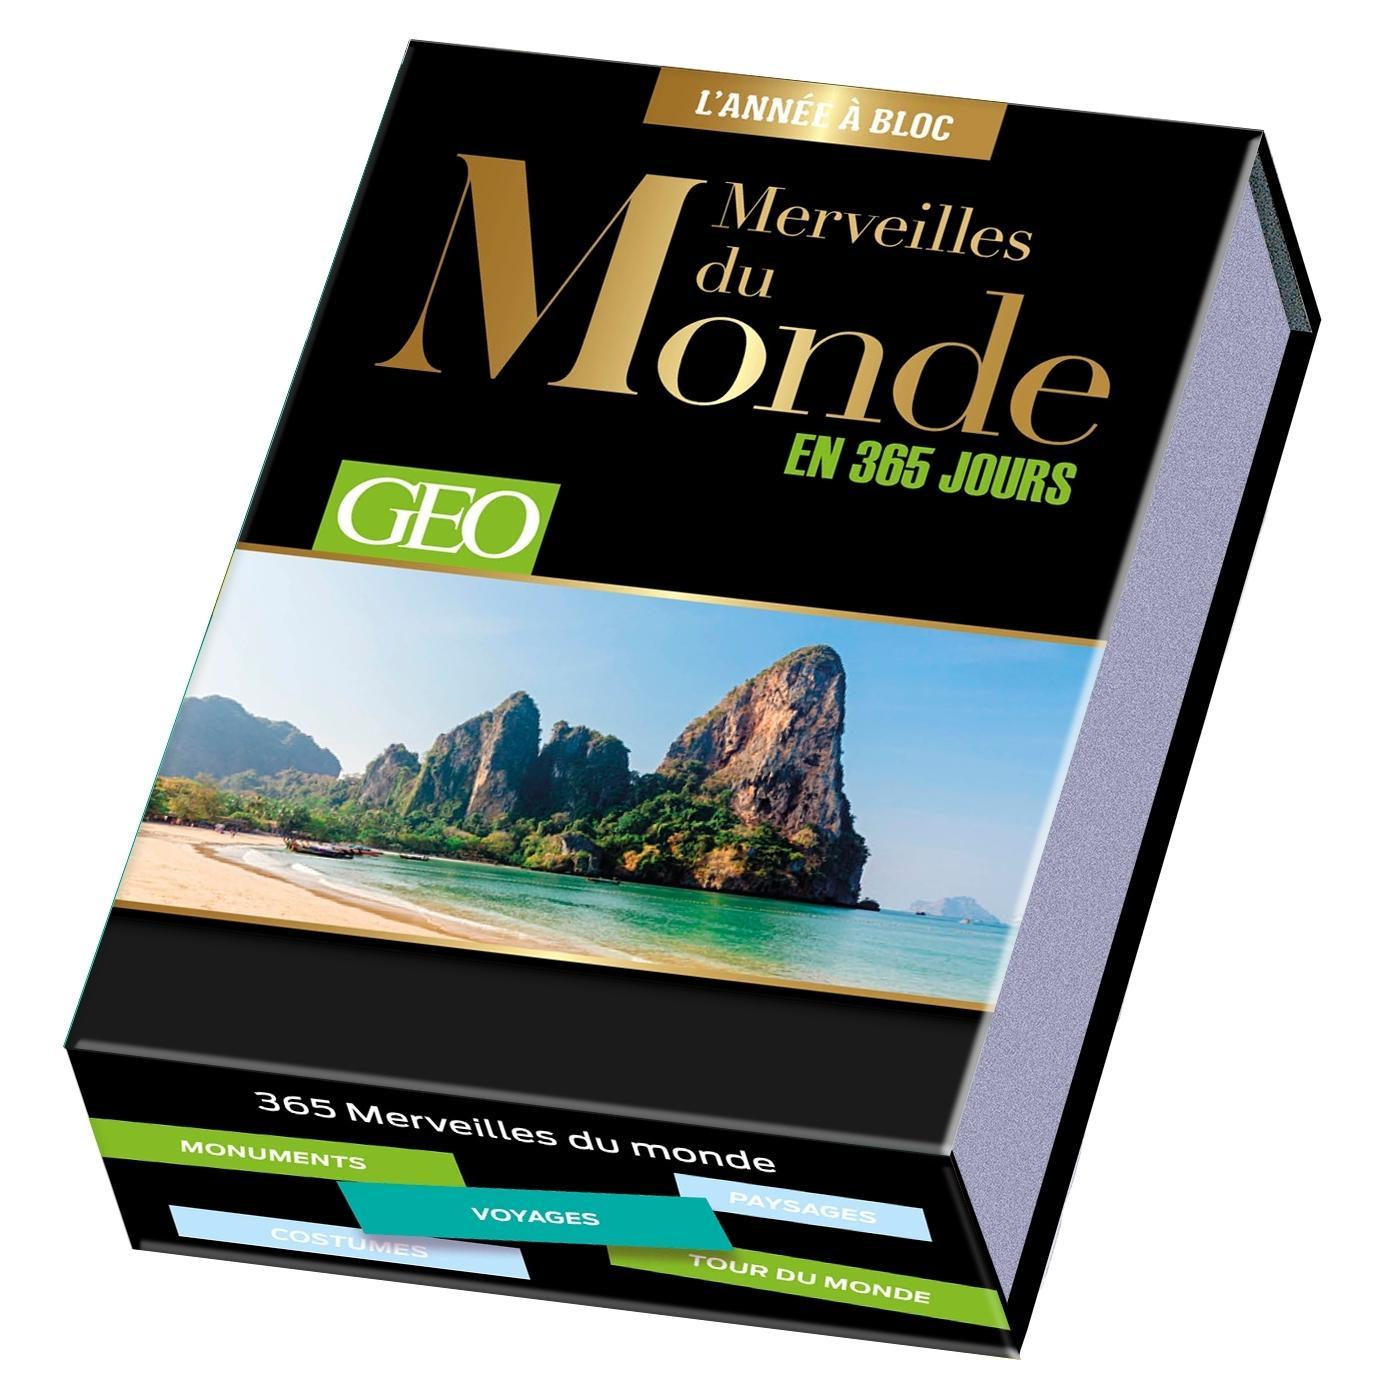 Calendrier Geo Merveilles Du Monde En 365 Jours L Annee A Bloc Librairie Eyrolles